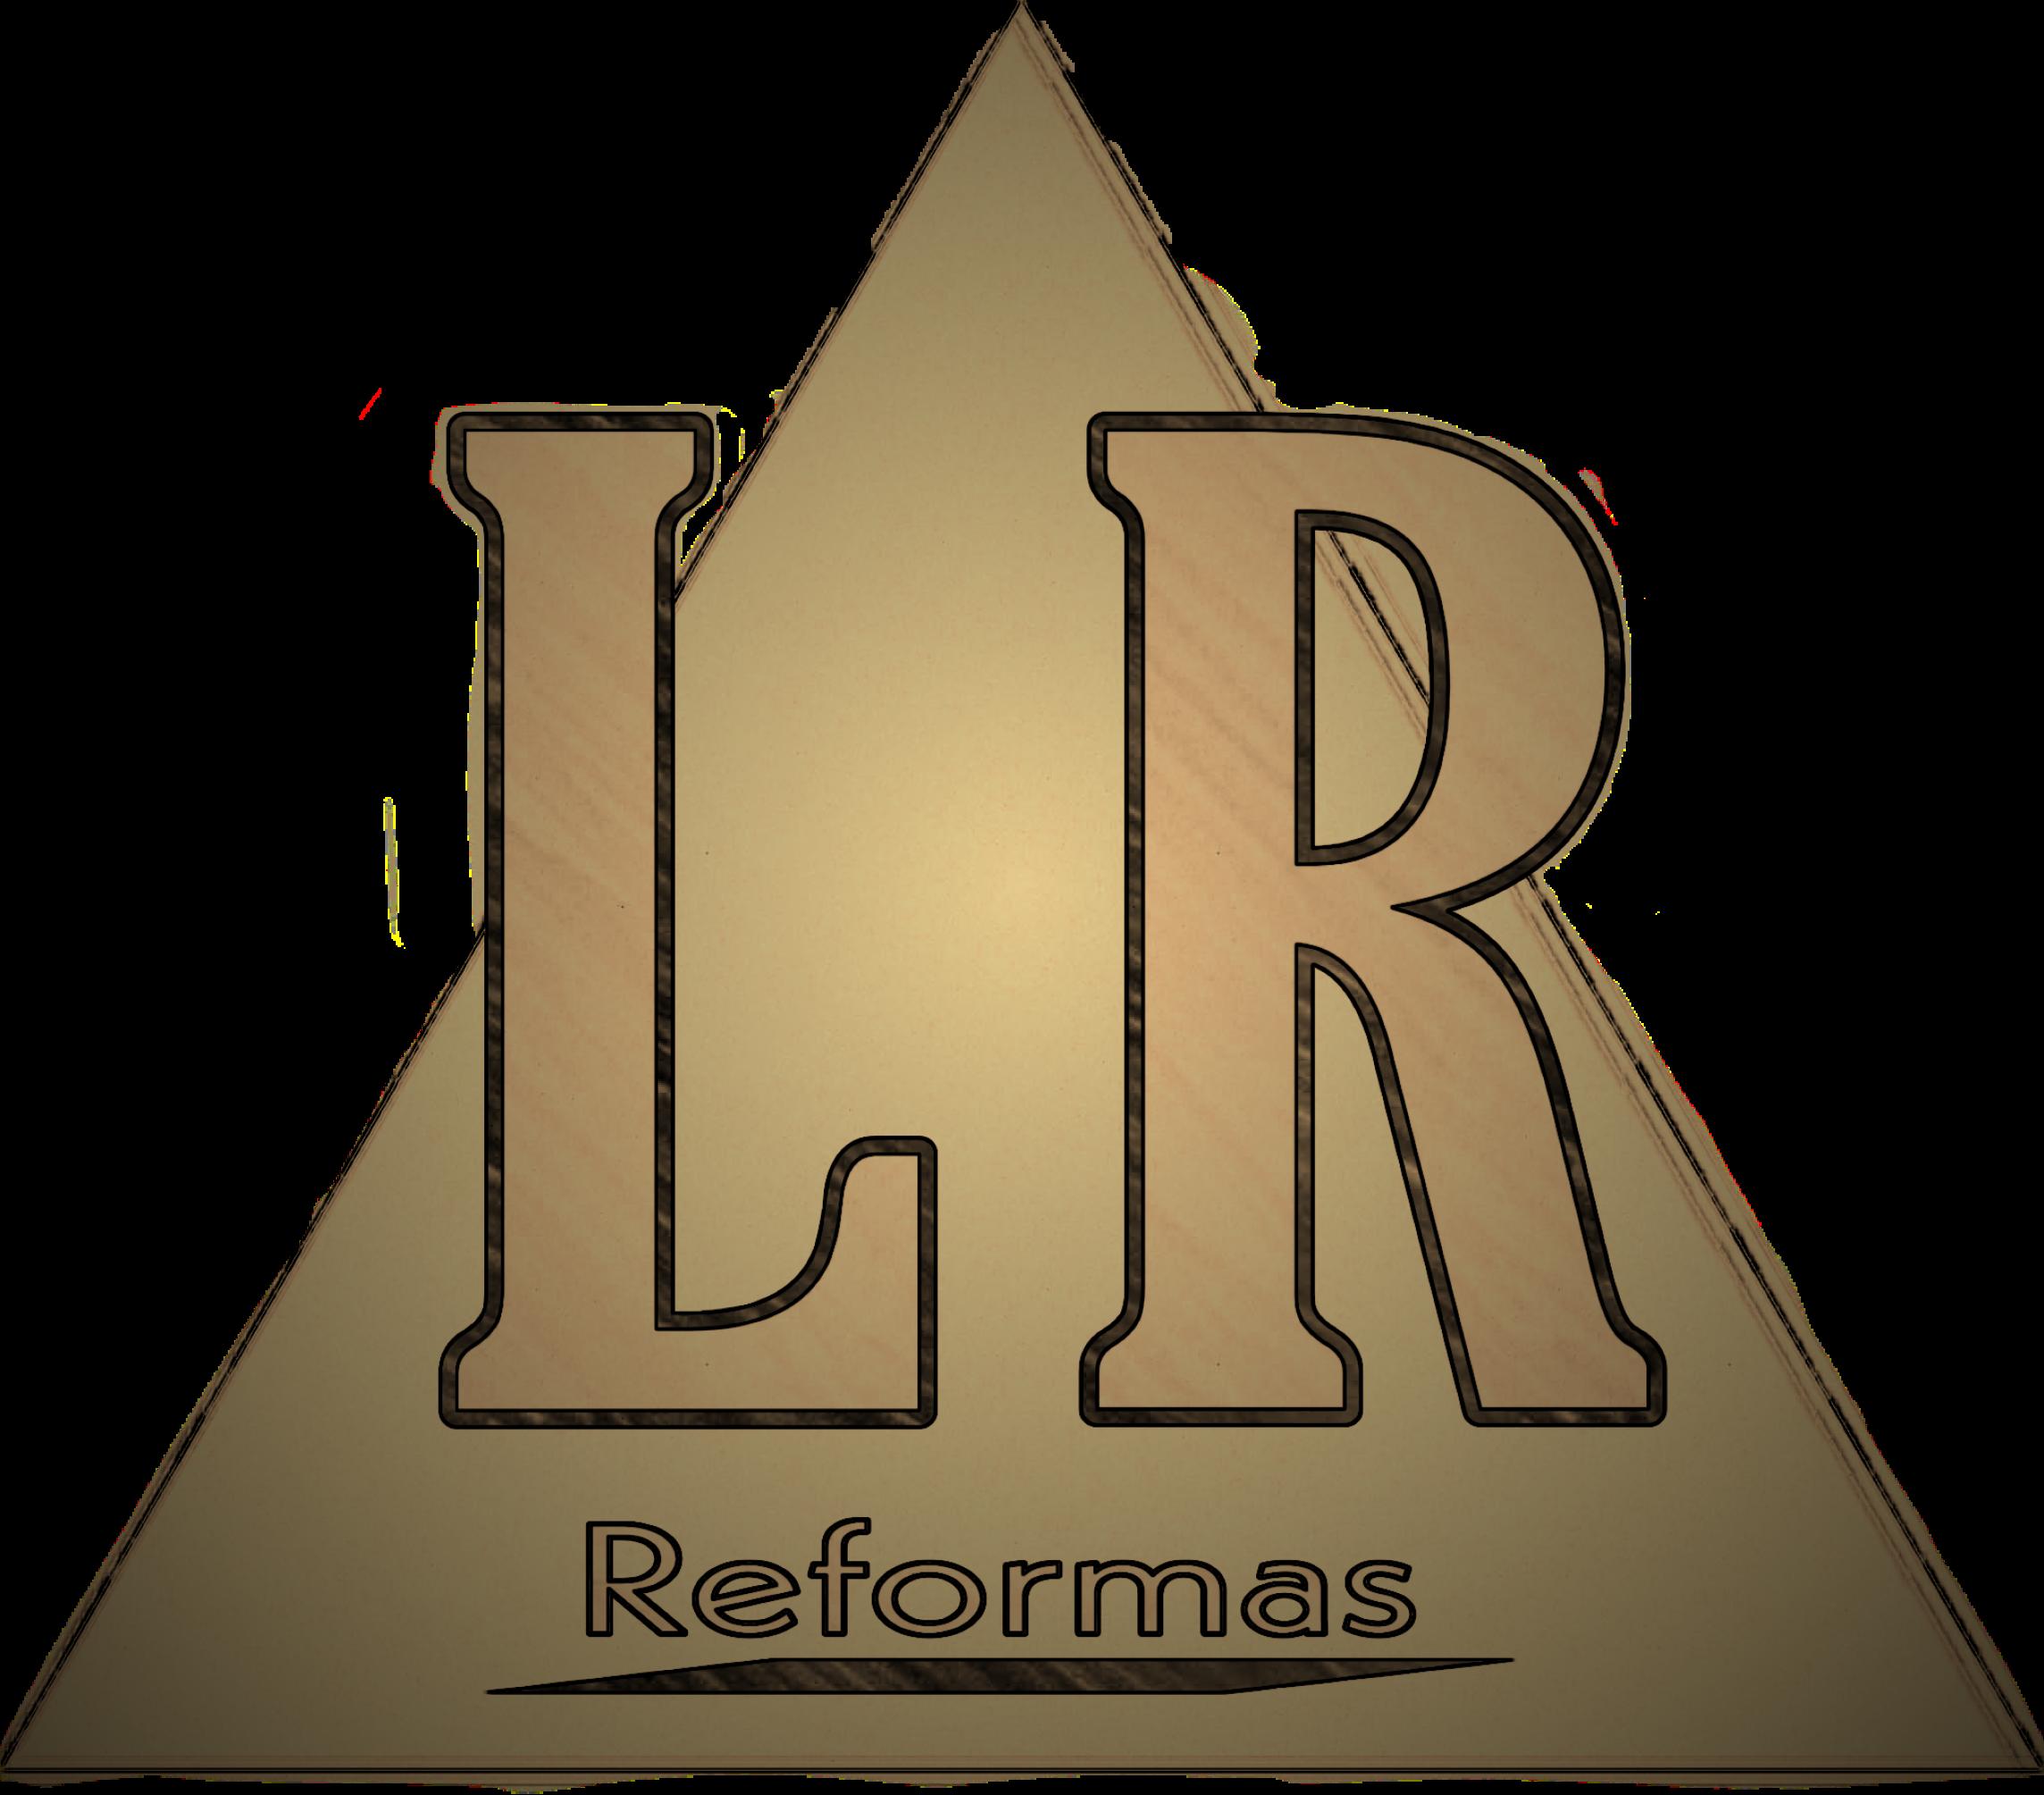 Lr Reformas